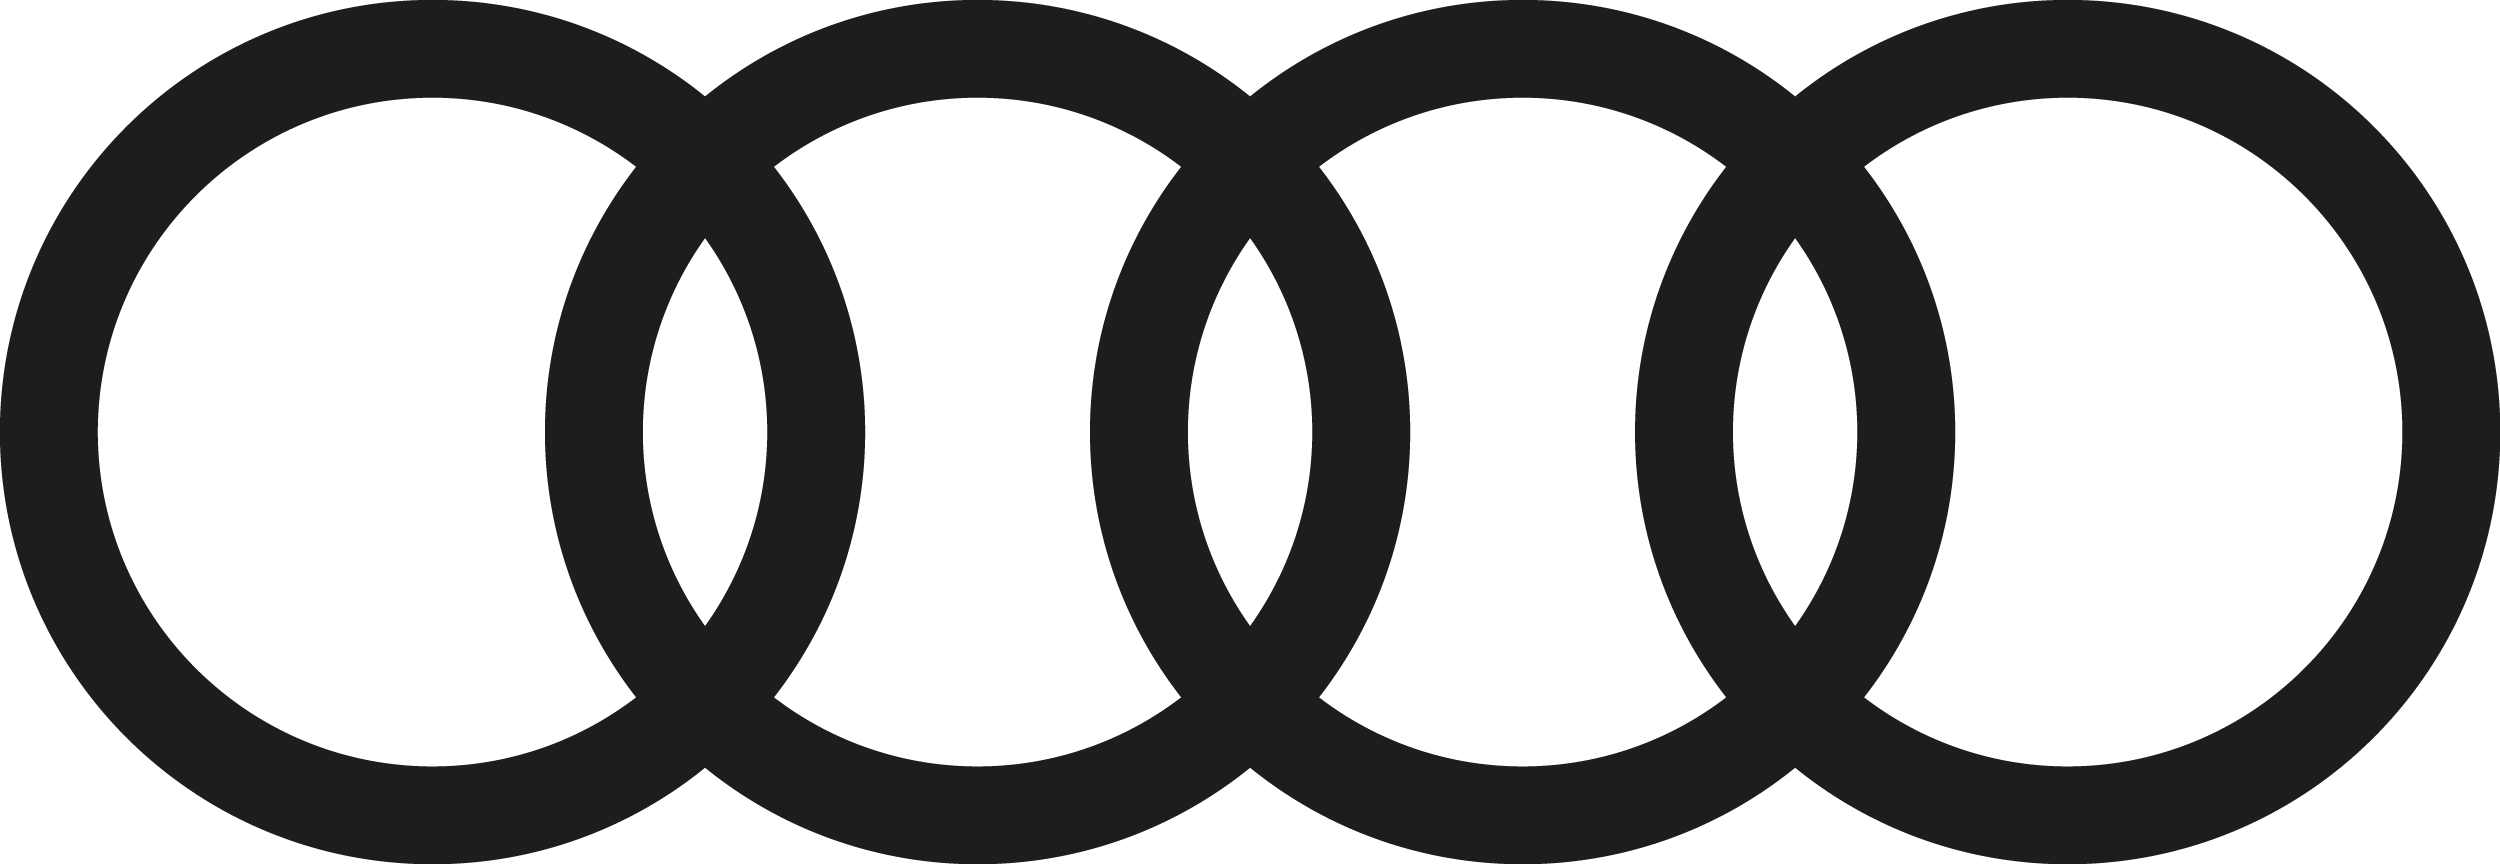 Audi logo vector eps. Fundraiser clipart magazine